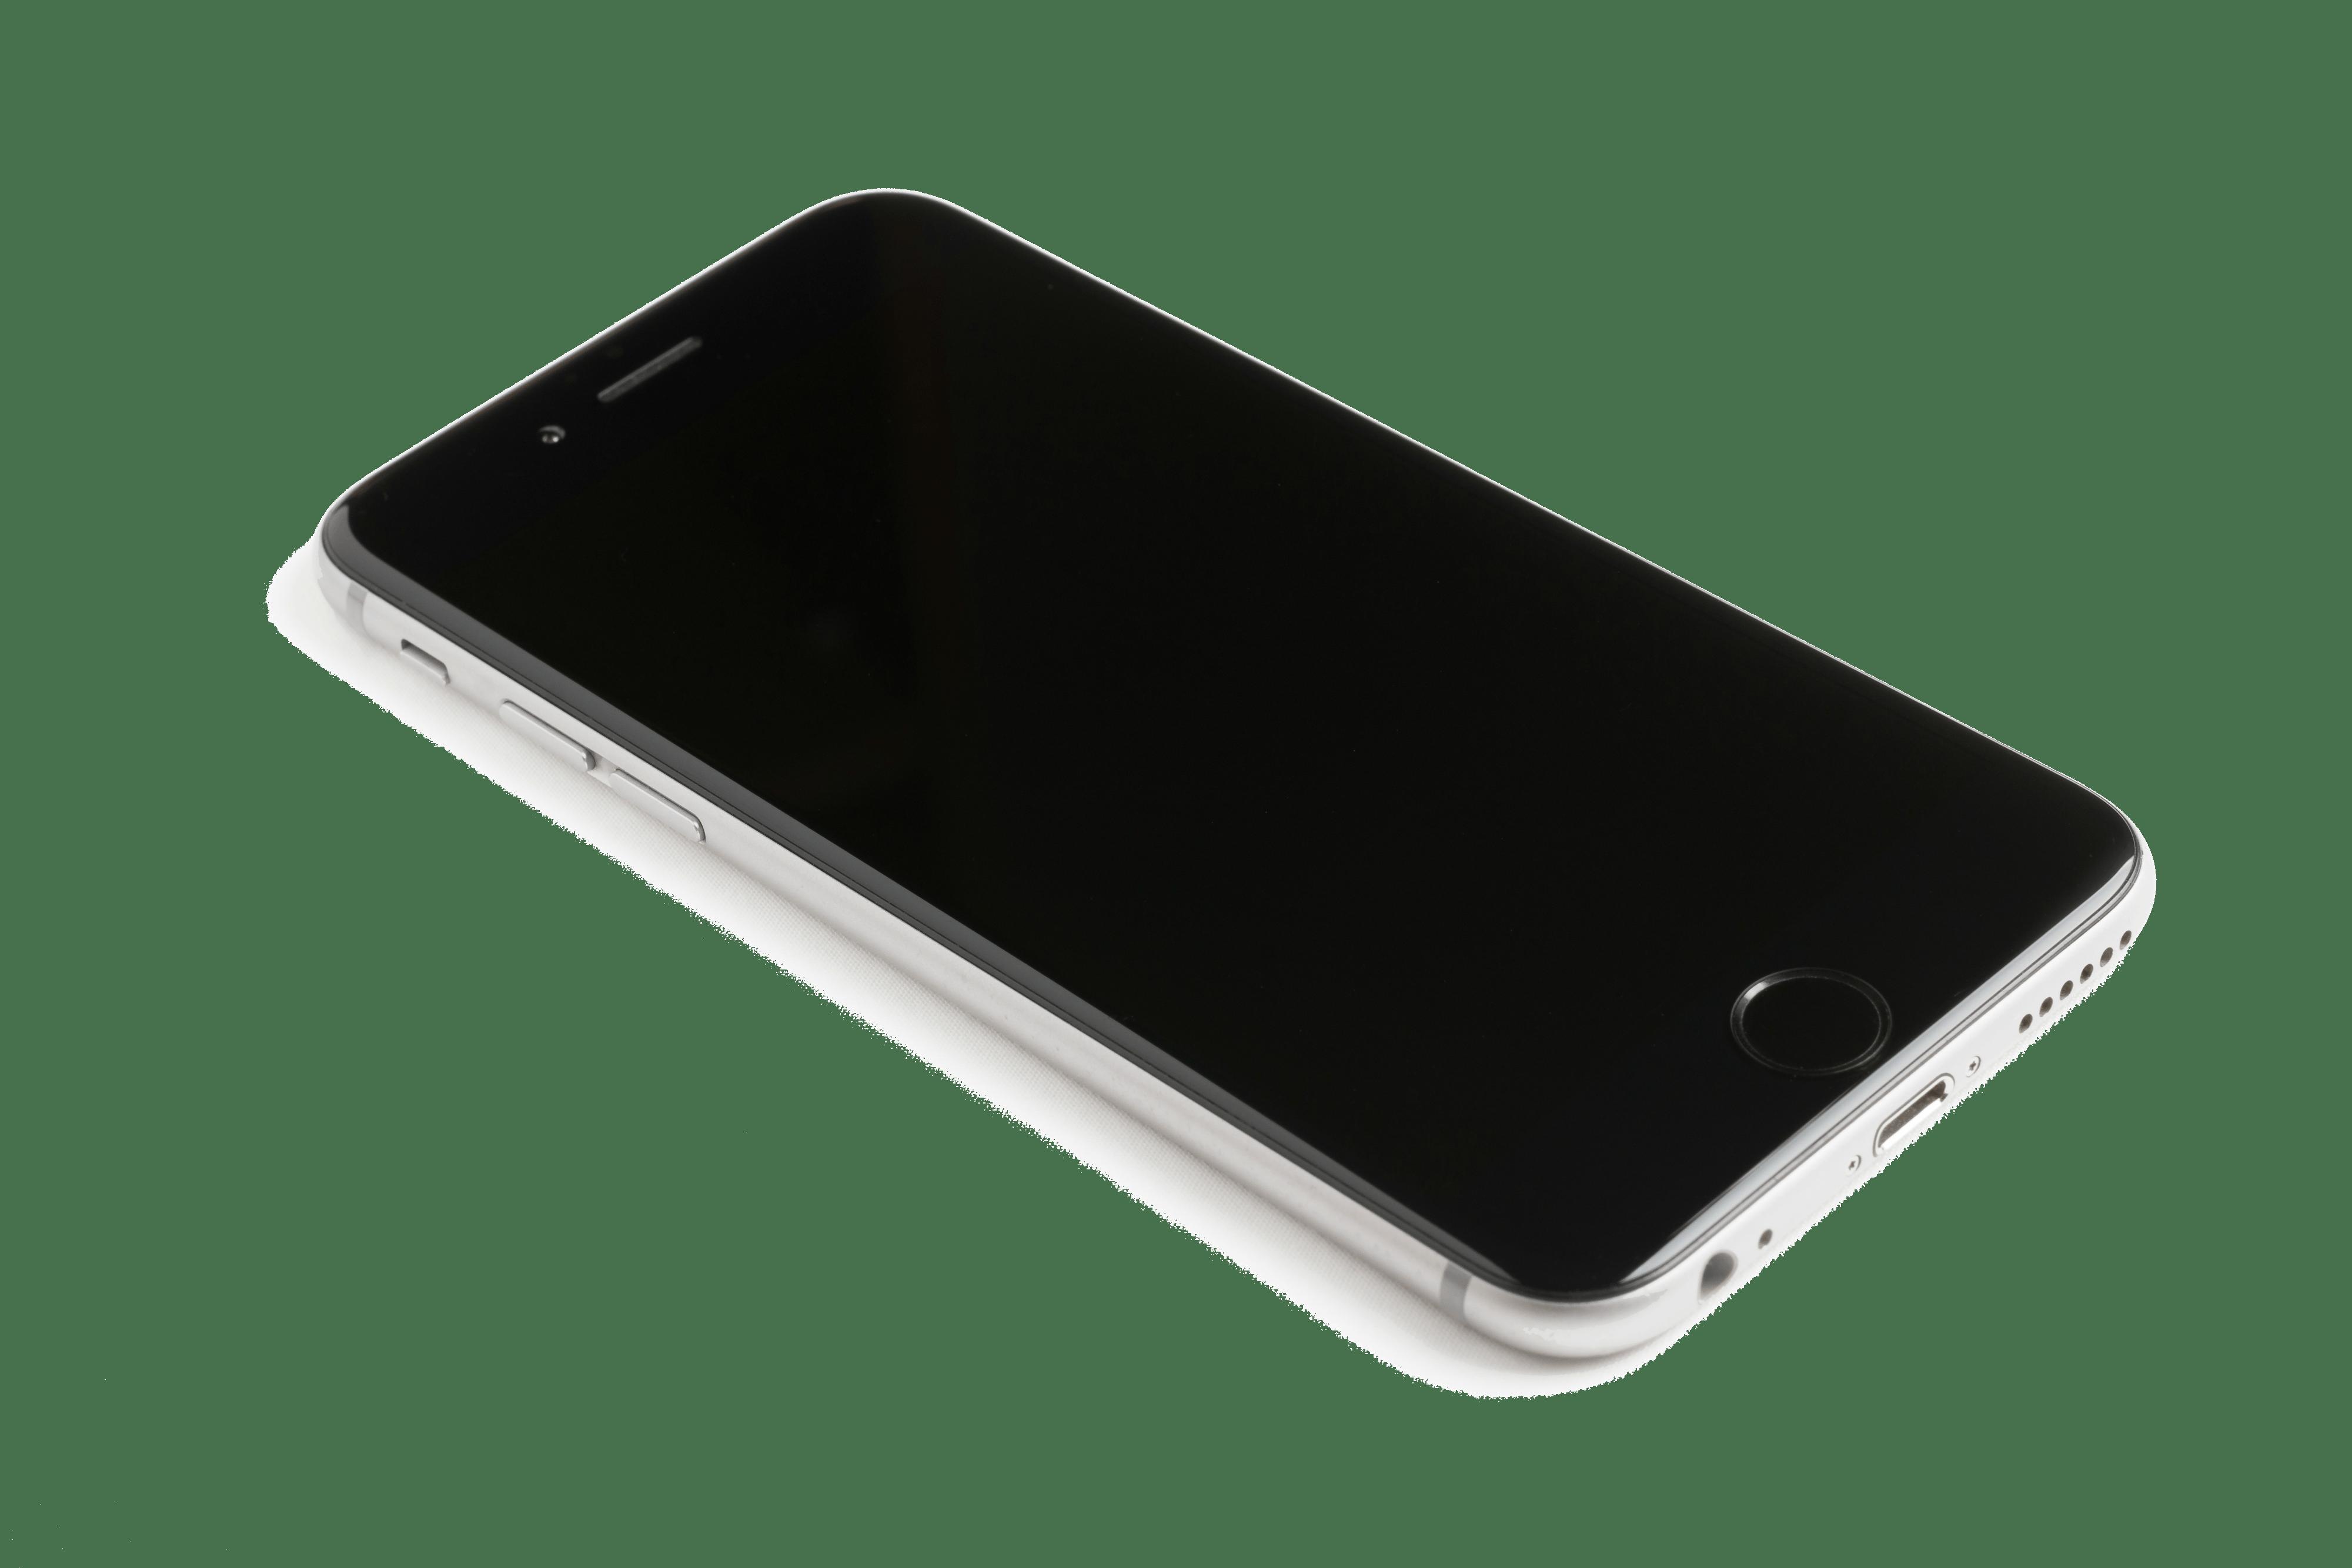 apple device, cellphone, gadget